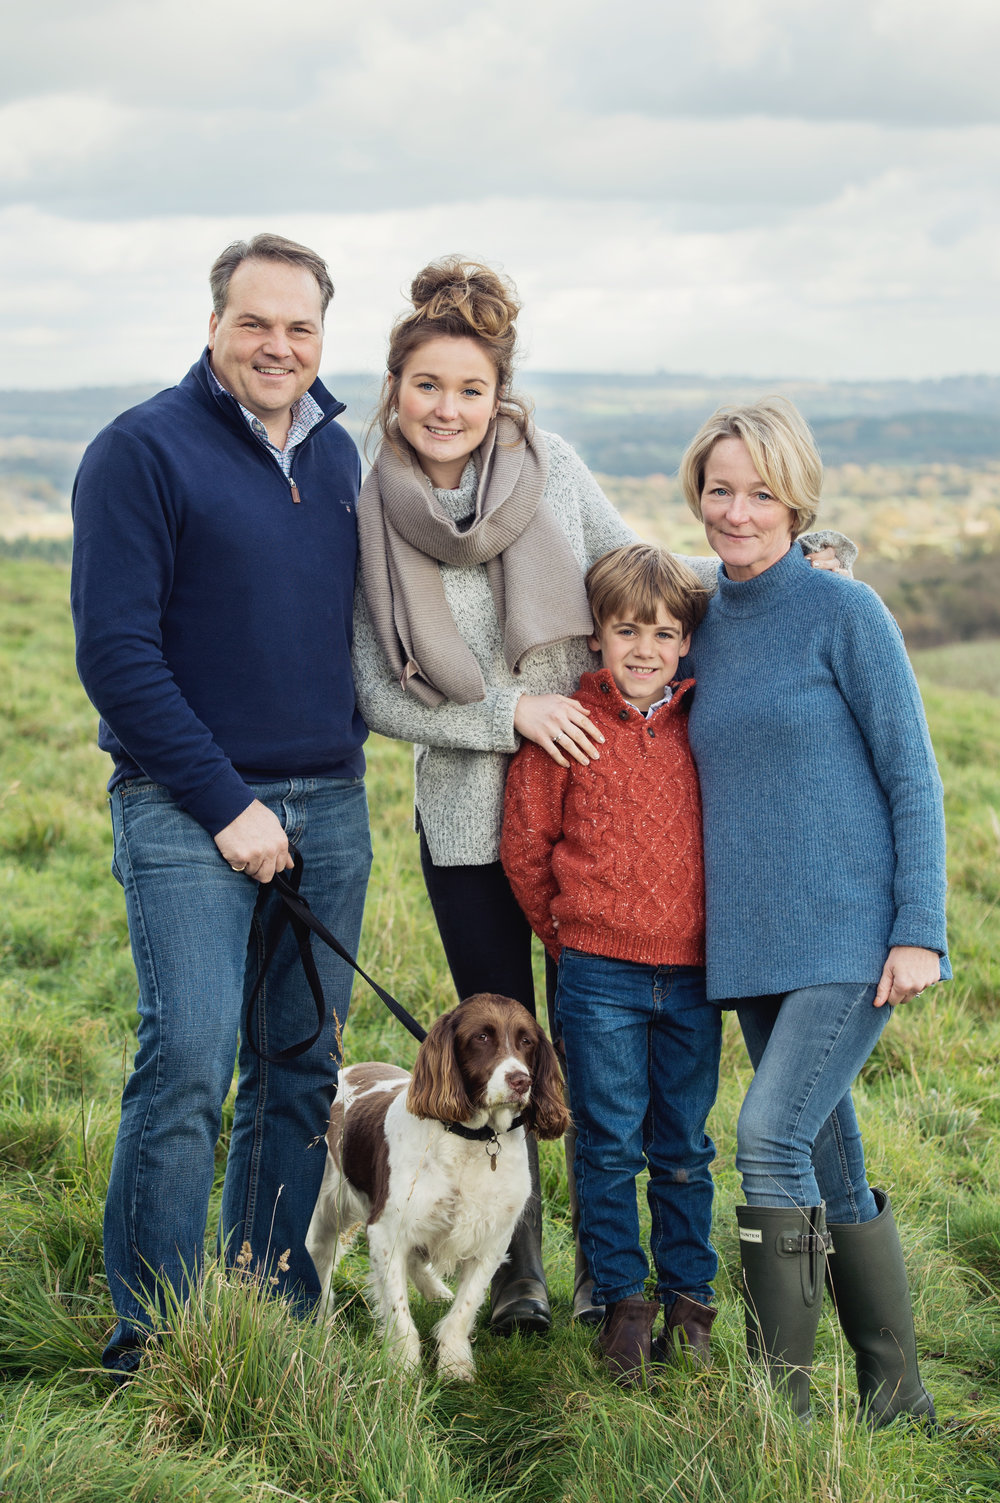 Ismay family-0821 edt crop.jpg